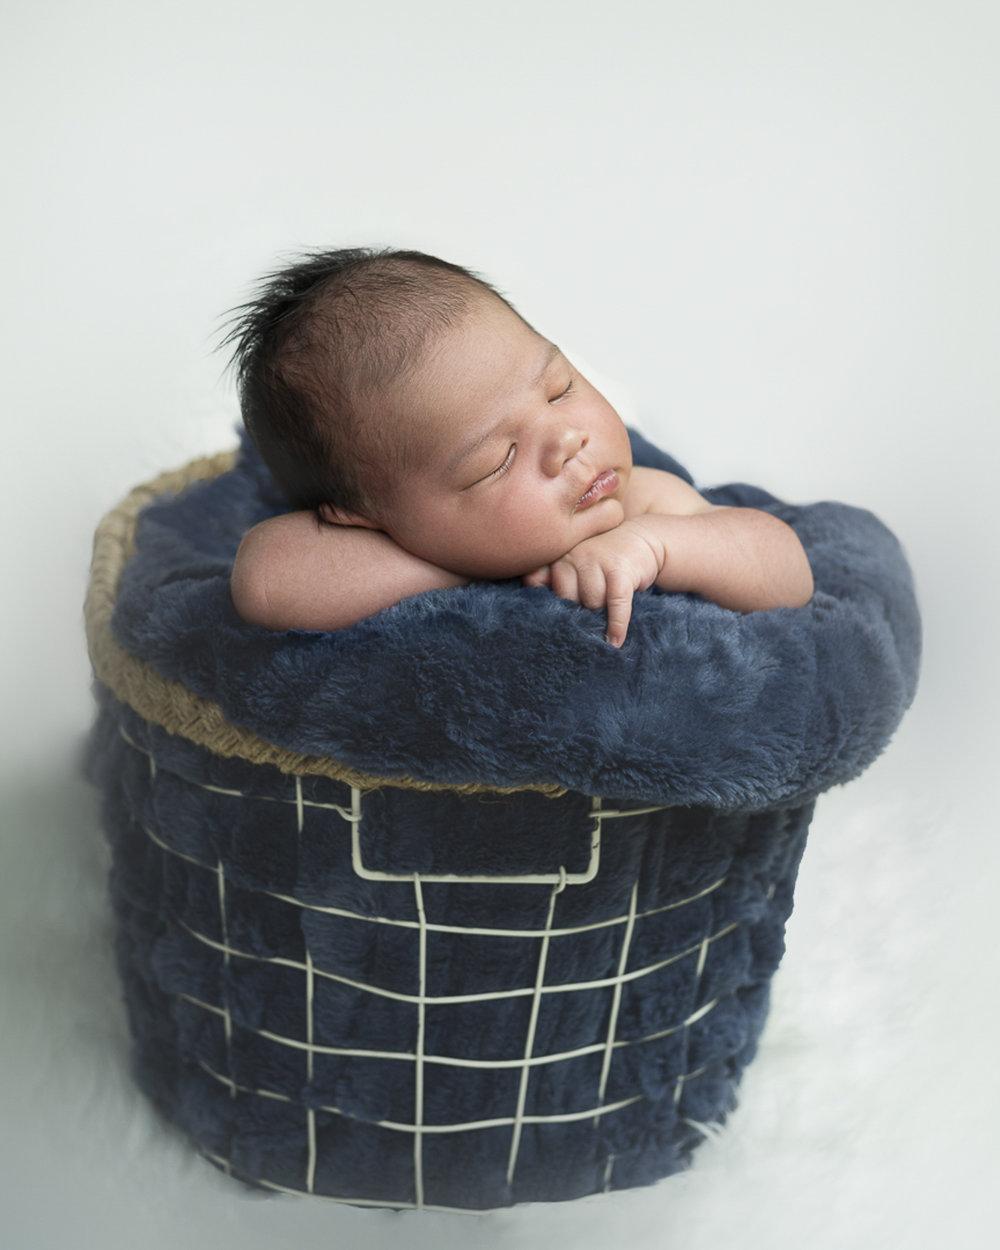 Newborn boy basket pose by NP Photography